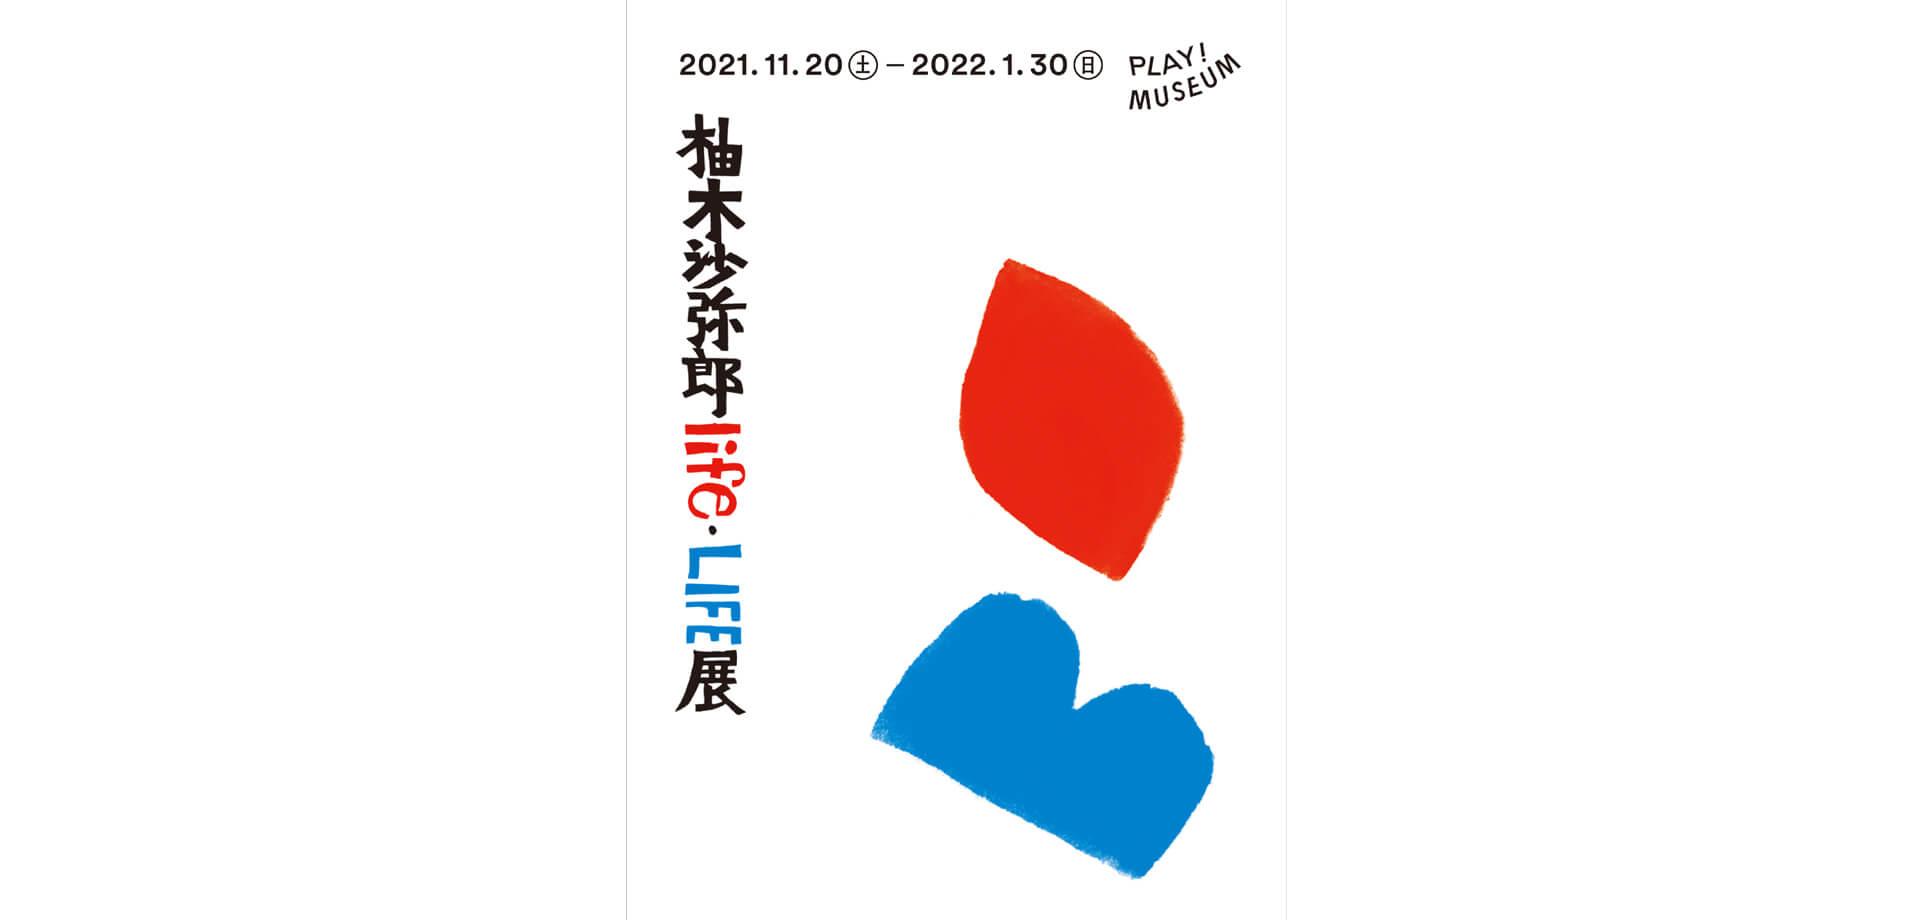 PLAY! MUSEUM「柚木沙弥郎 life・LIFE」展